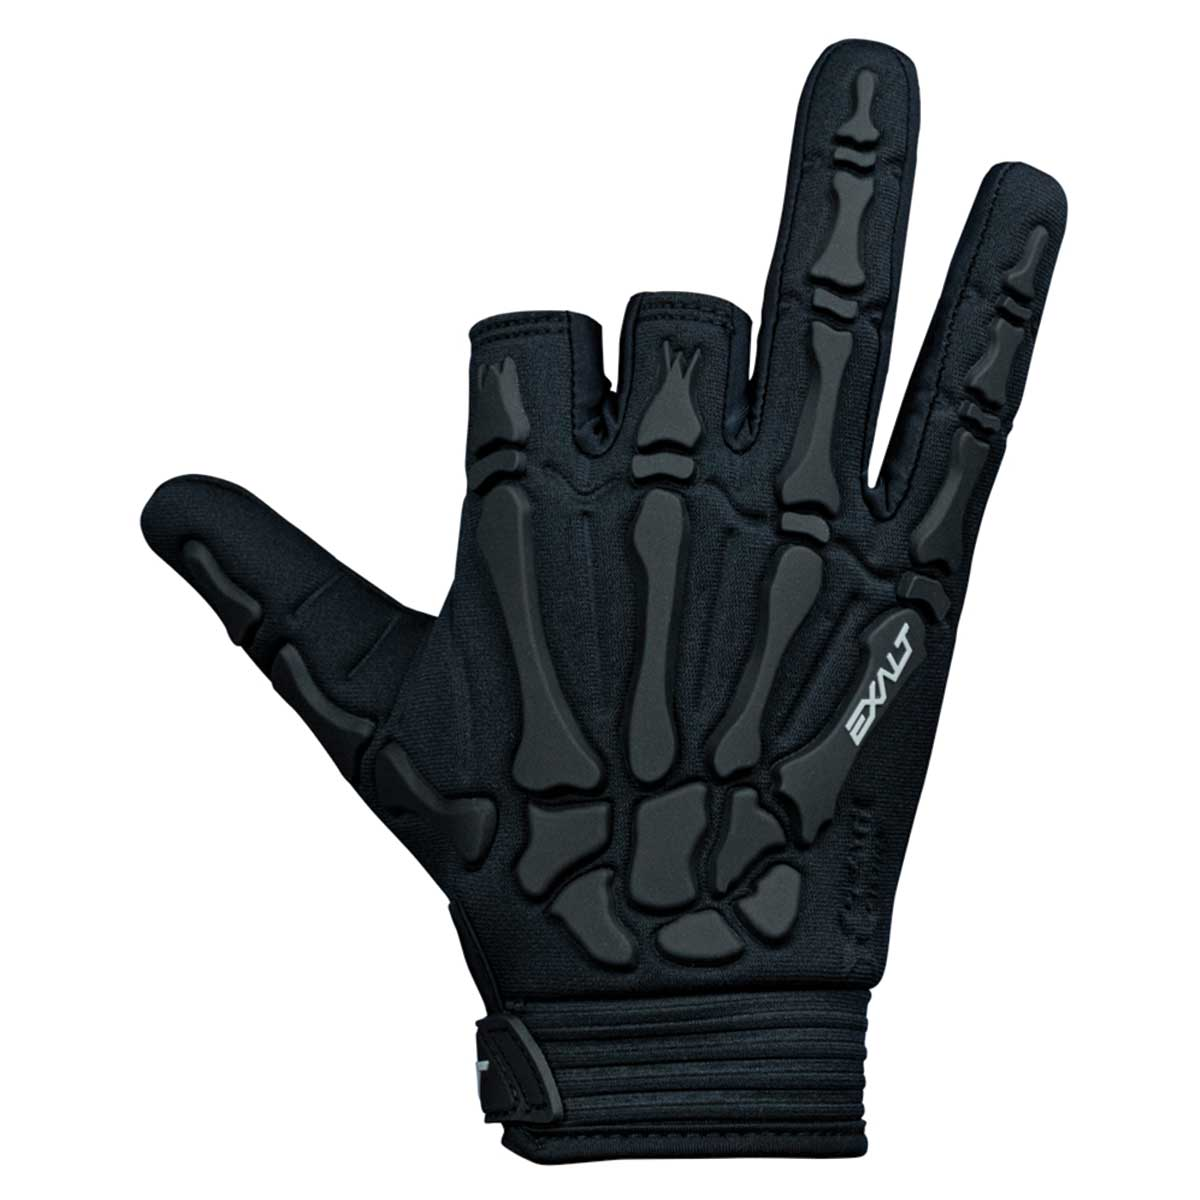 Exalt Paintball Death Grip Gloves - Black